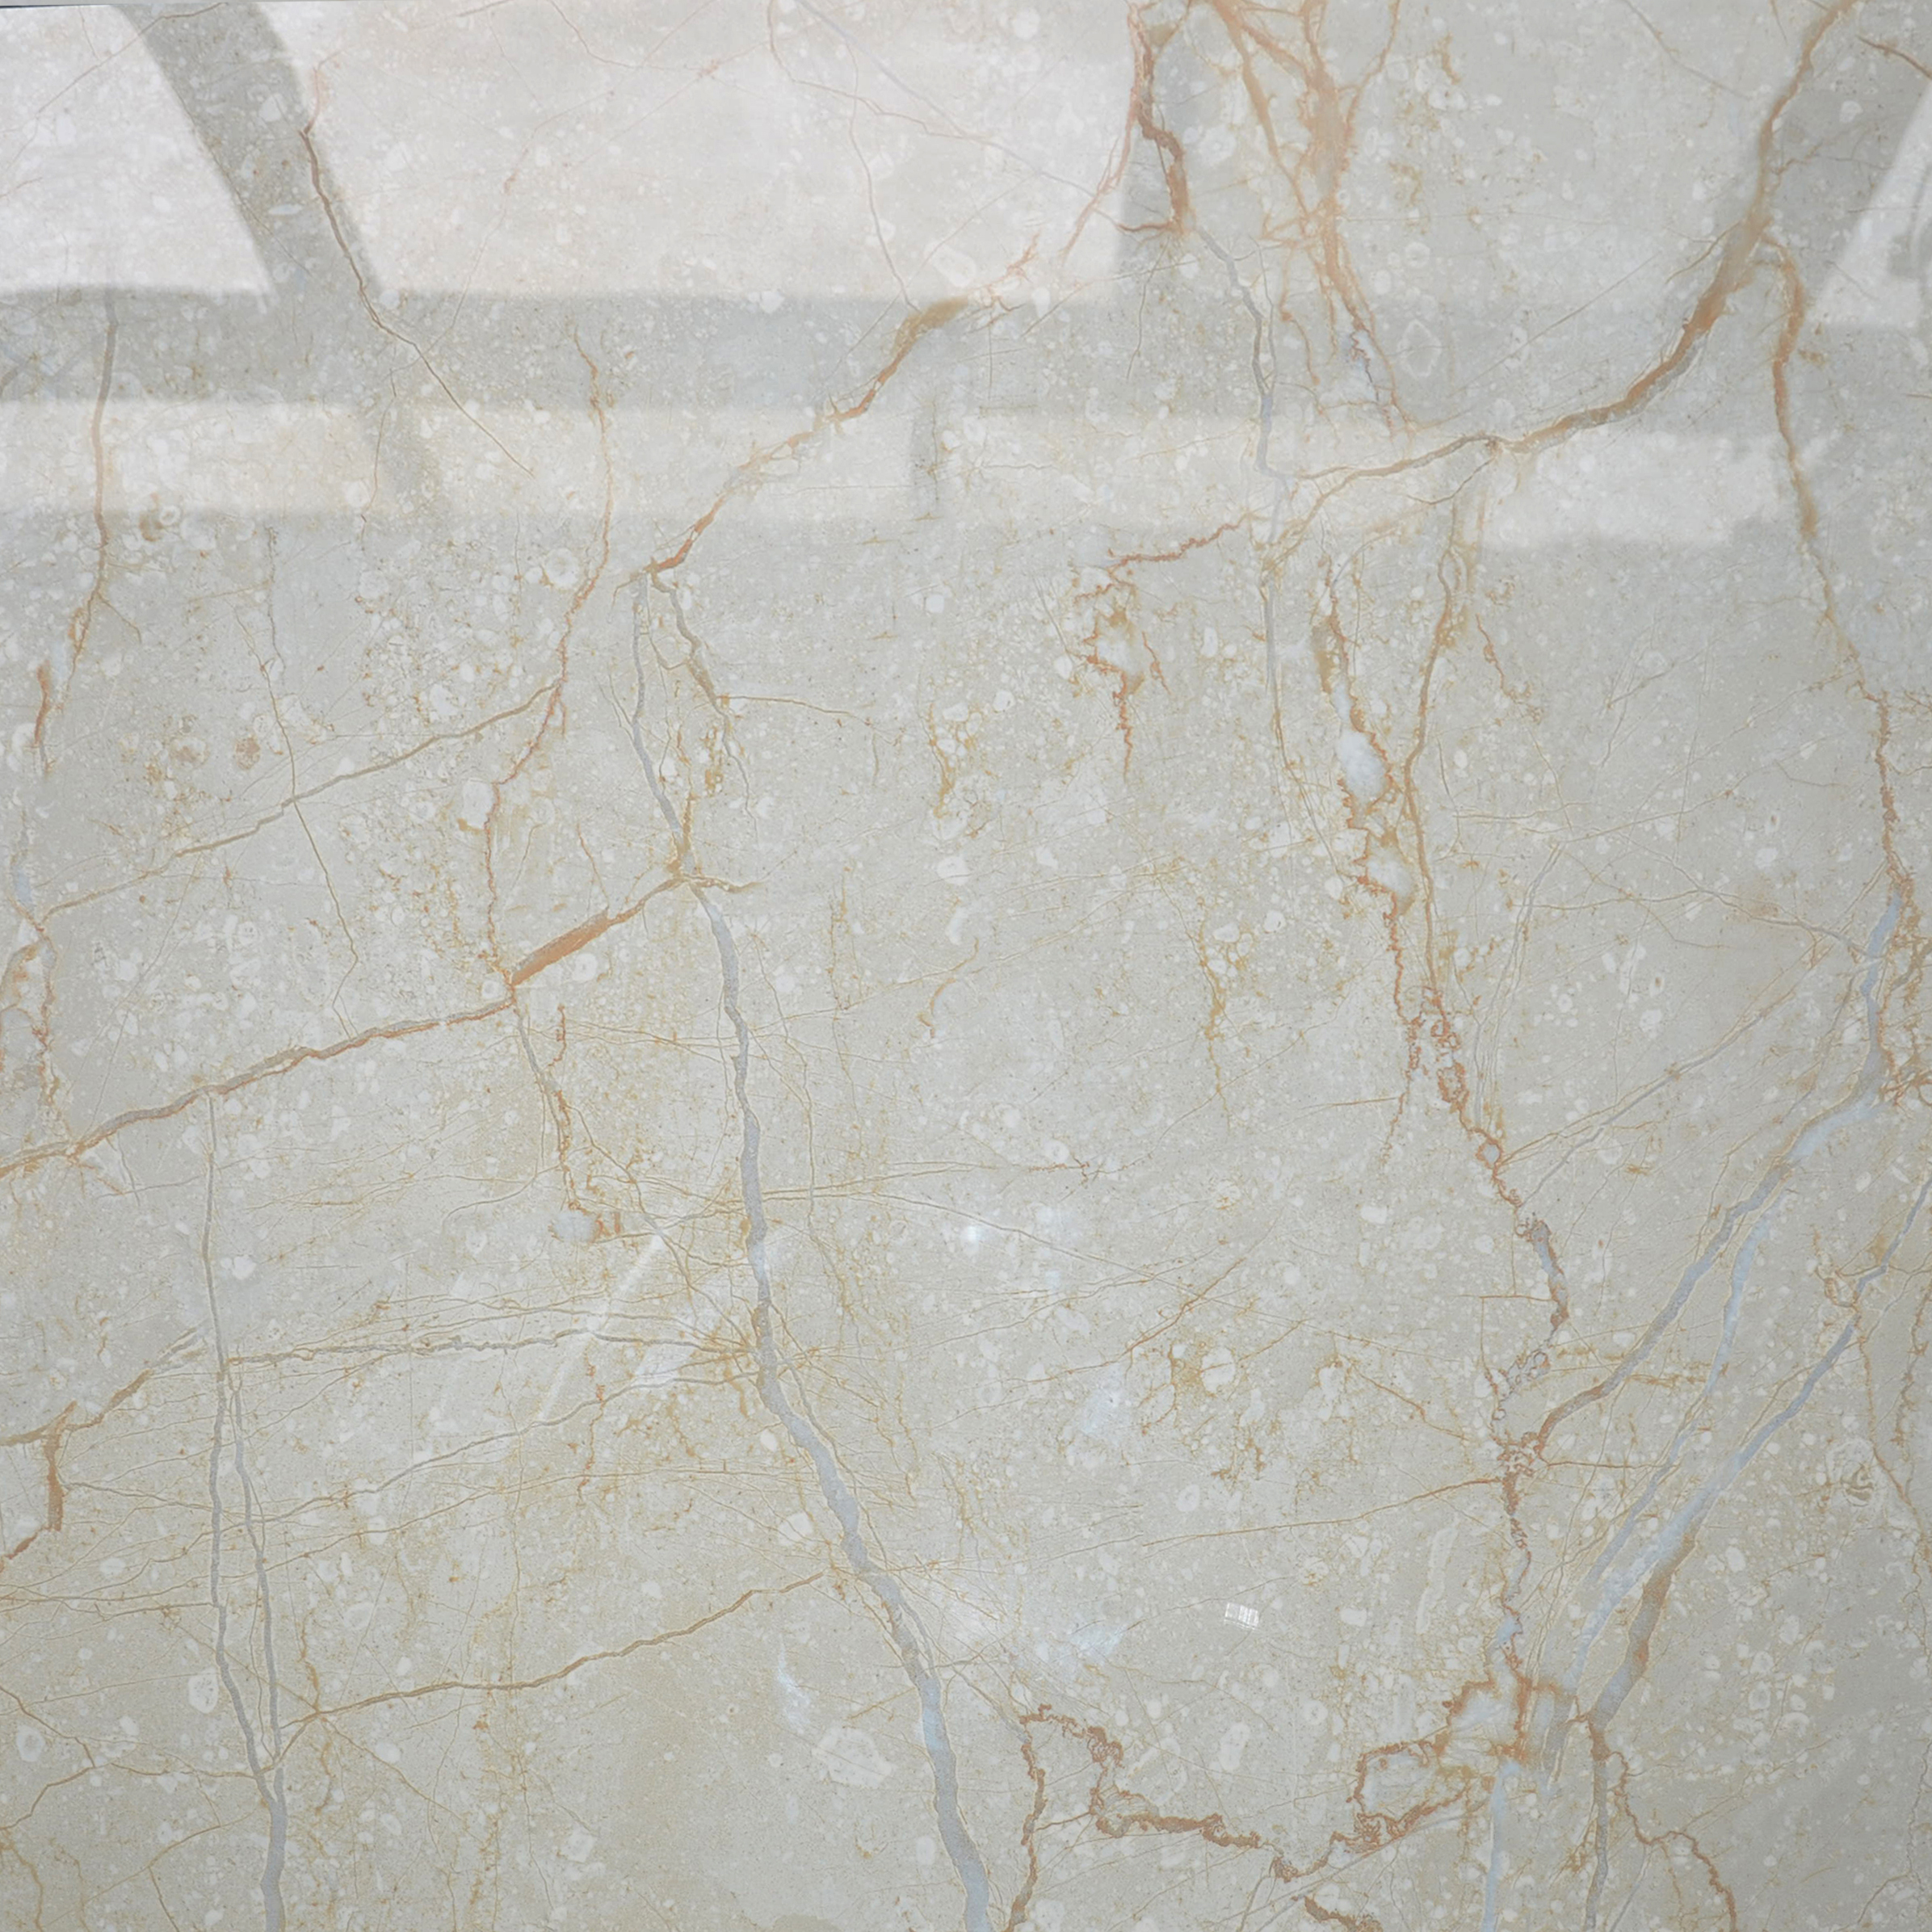 HB6253 azulejo blanco estupendo, blanco de Carrara azulejo, alto brillo blanco baldosa